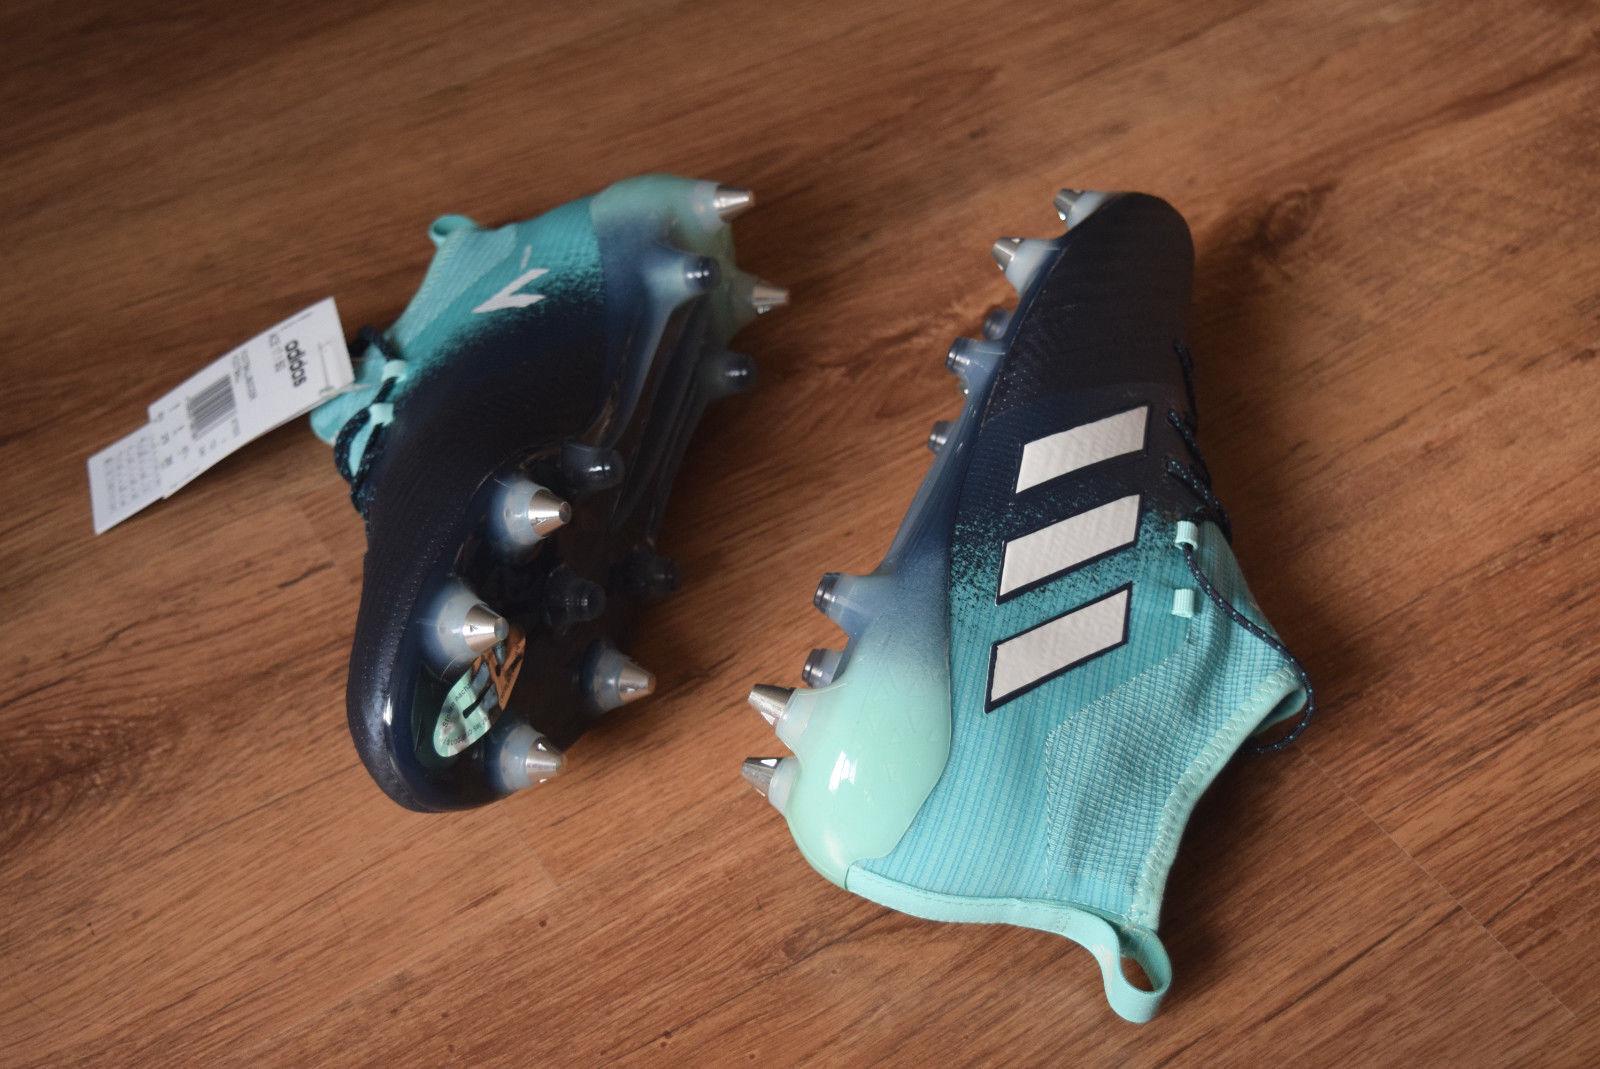 Adidas ACE 17.1 SG    40 41 42 42,5 43 soft ground S77050 Fußballschuhe protator 45d21f